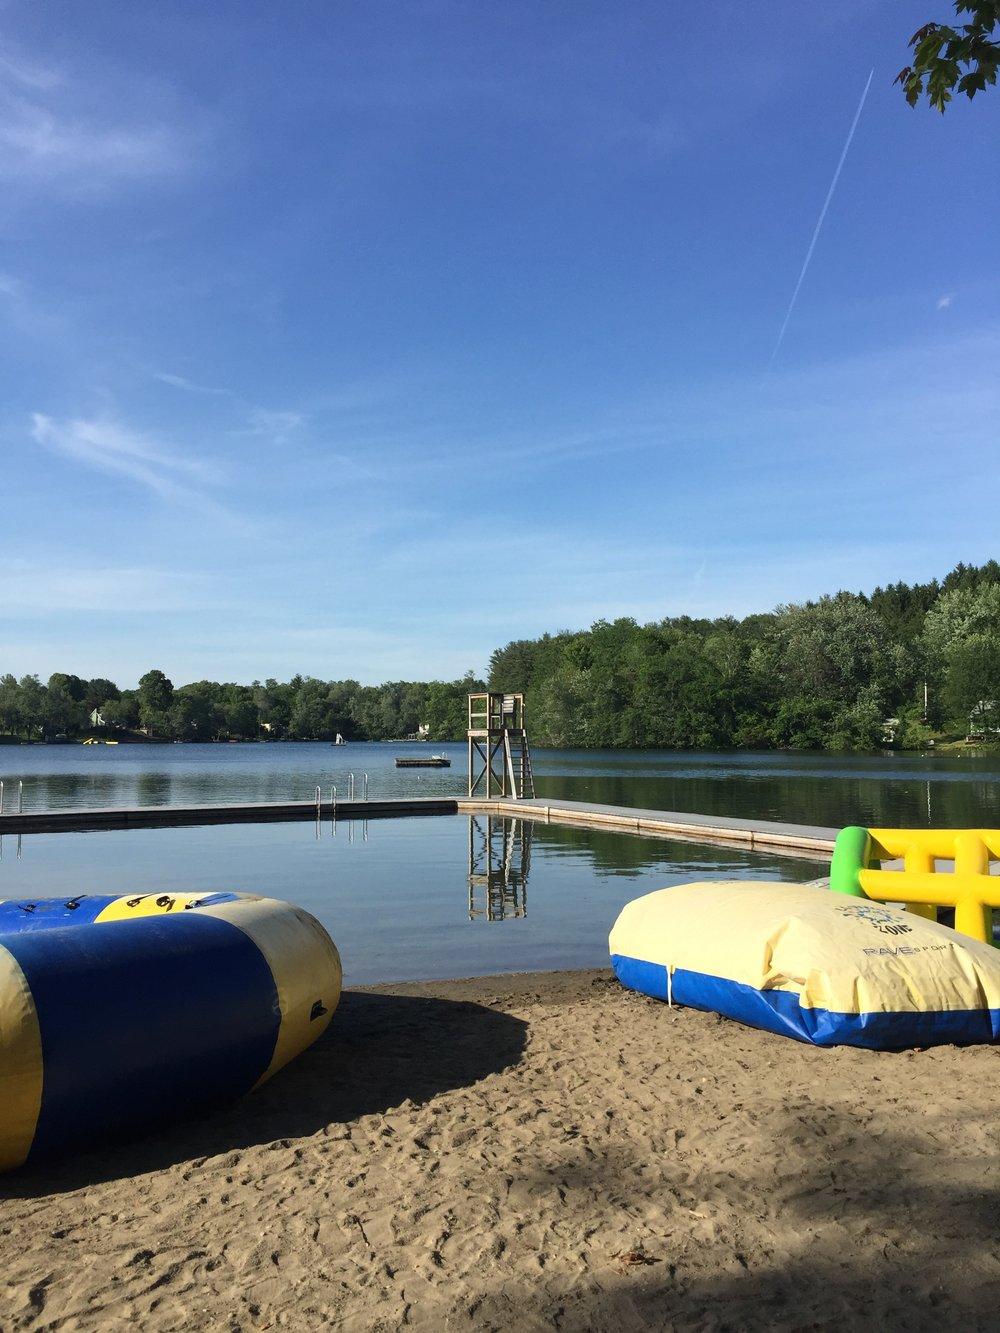 LSE Camp Lake3-min.JPG